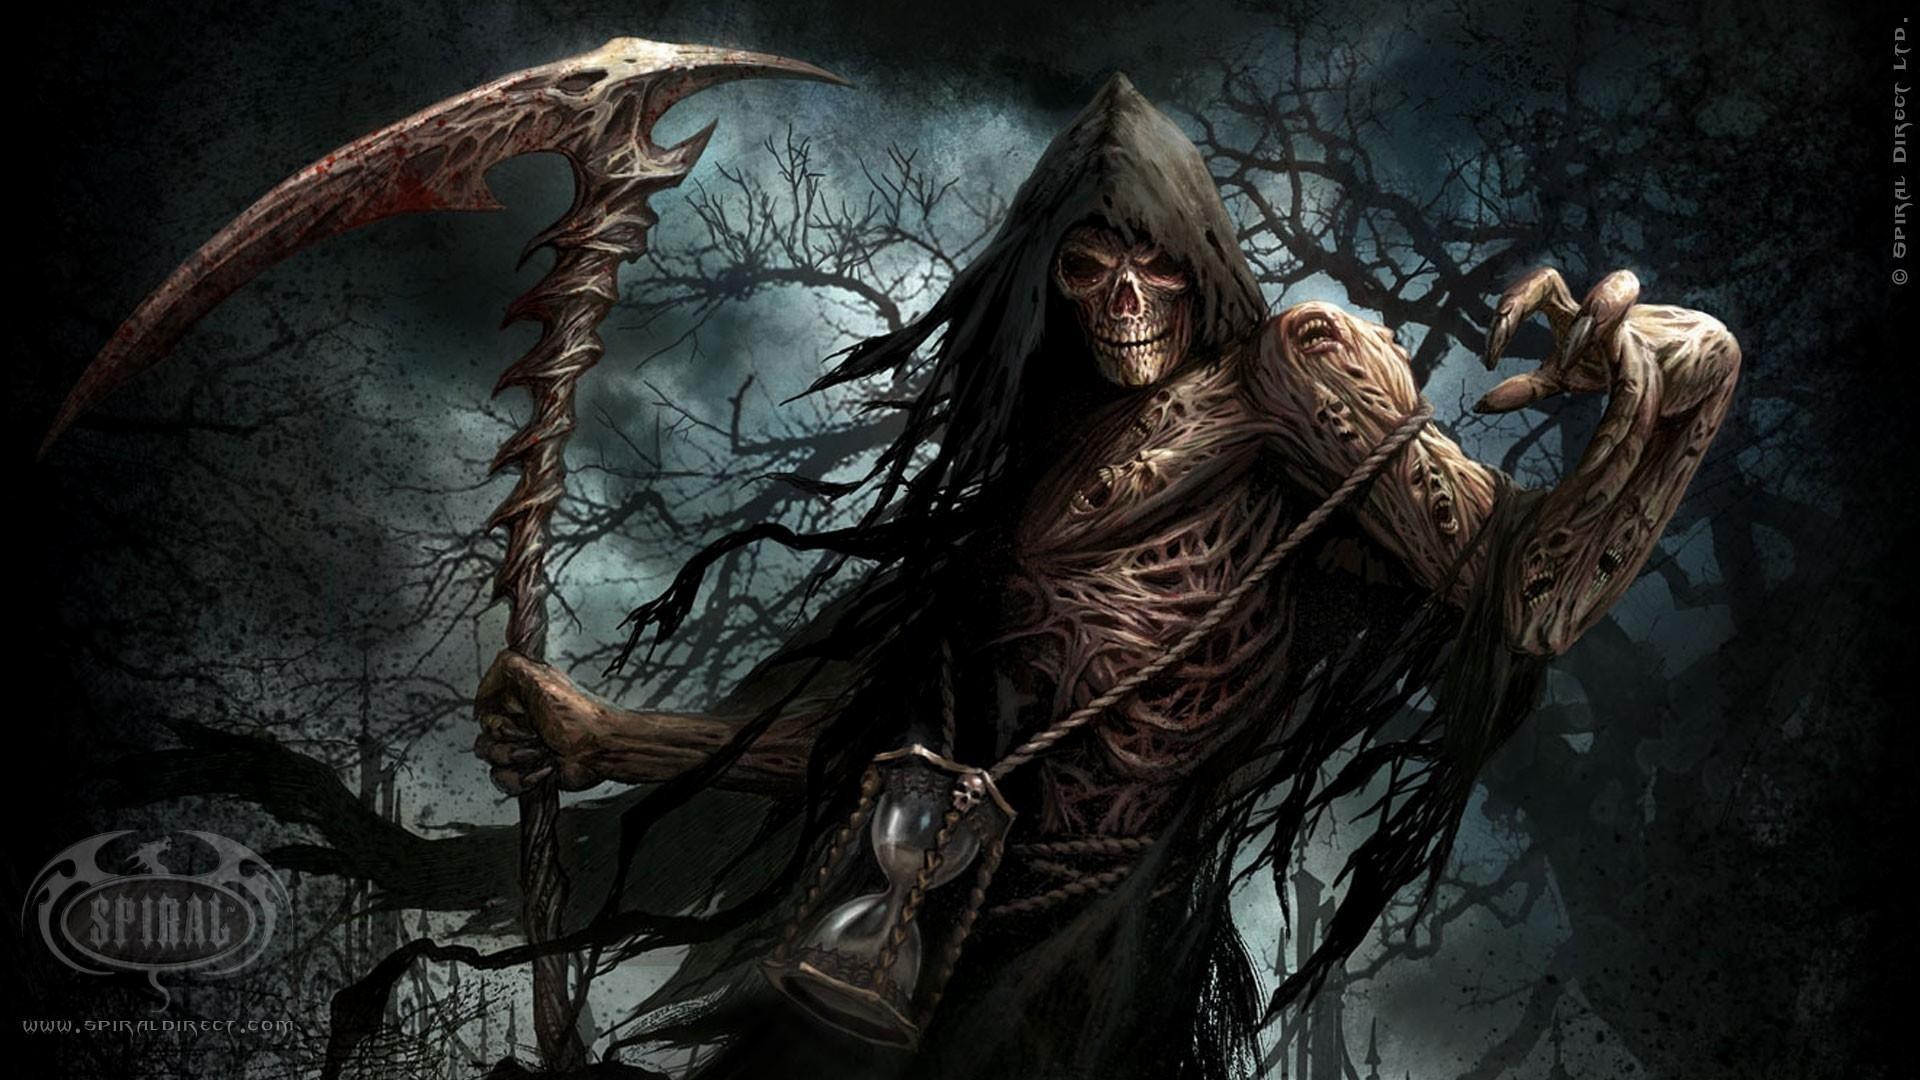 Dark Fantasy Wallpaper Hd 69 Images